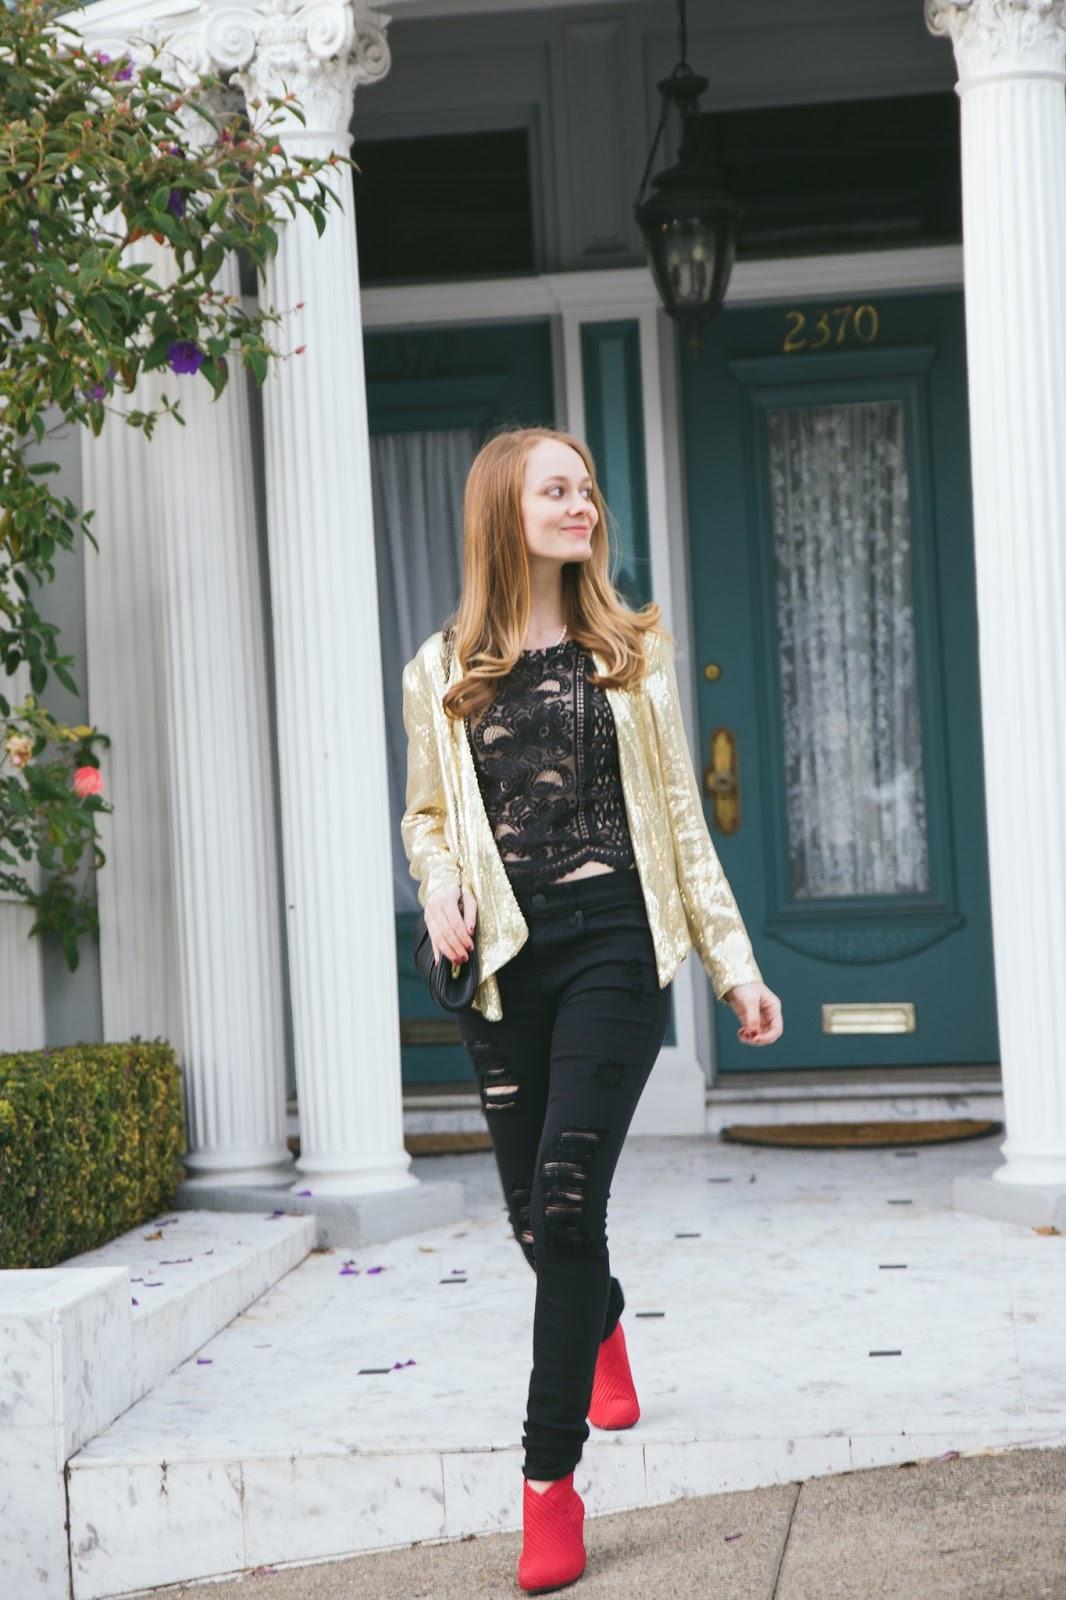 Gold-Sequin-Blazer-Red-Booties-San-Francisco-Blogger